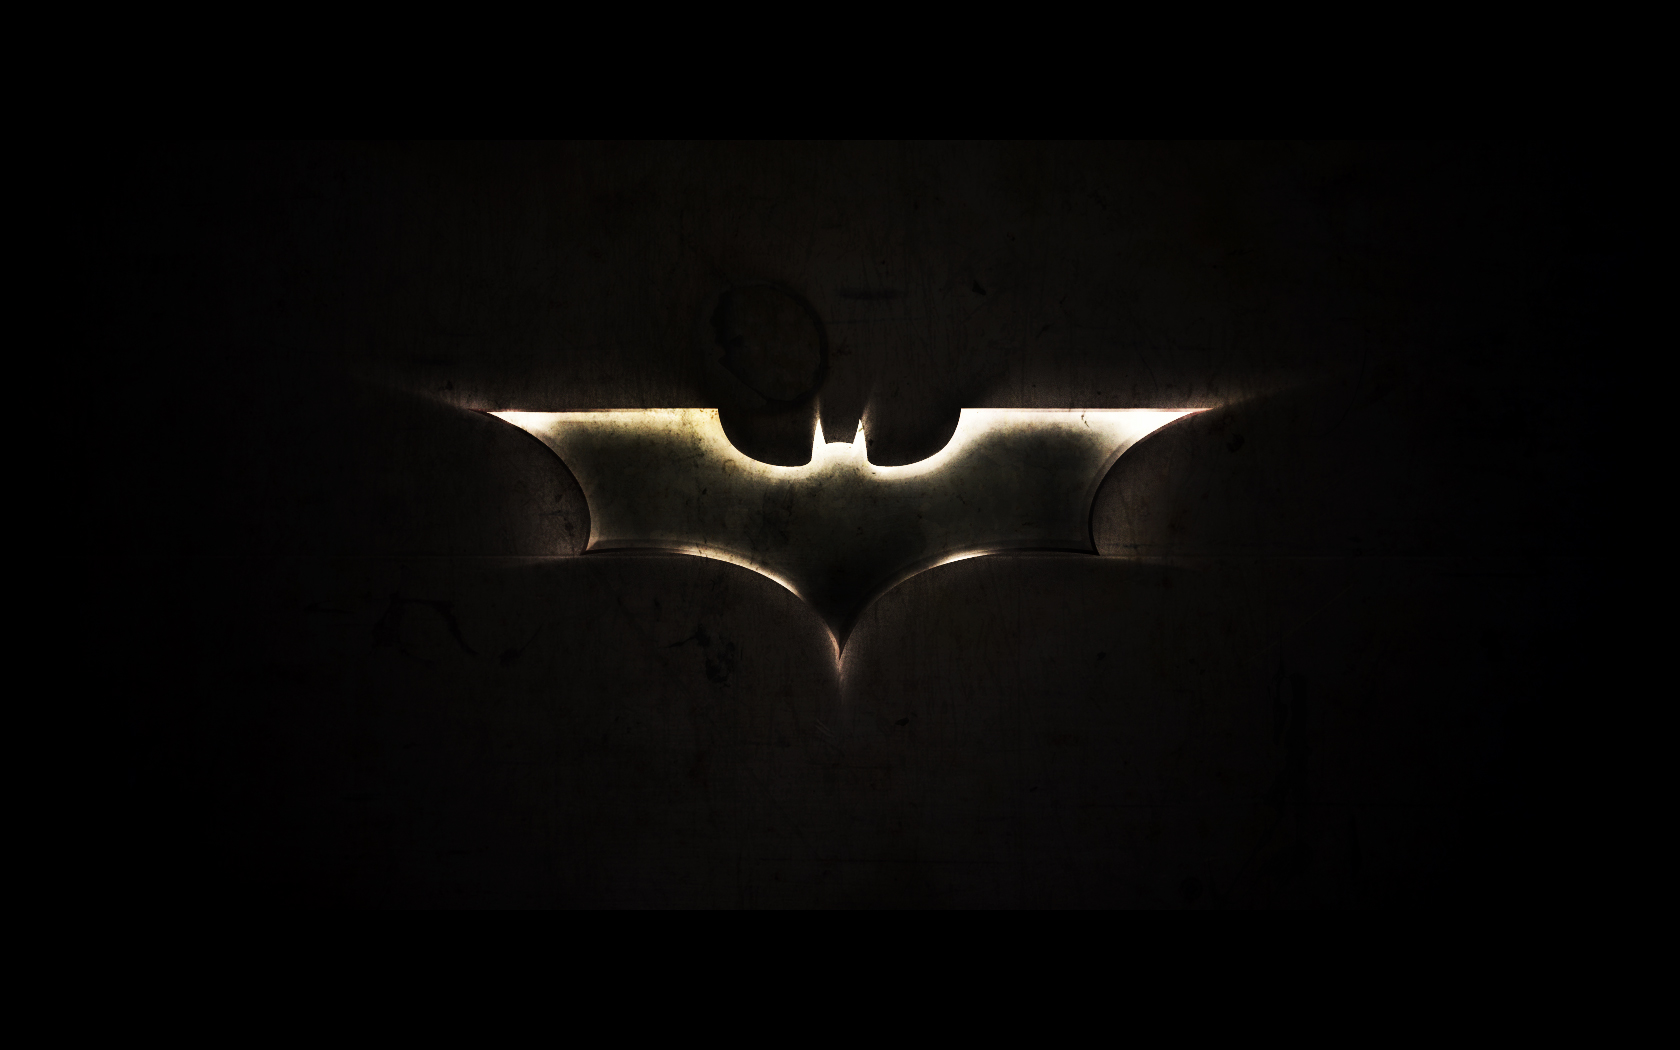 The Dark Knight Rises Villains